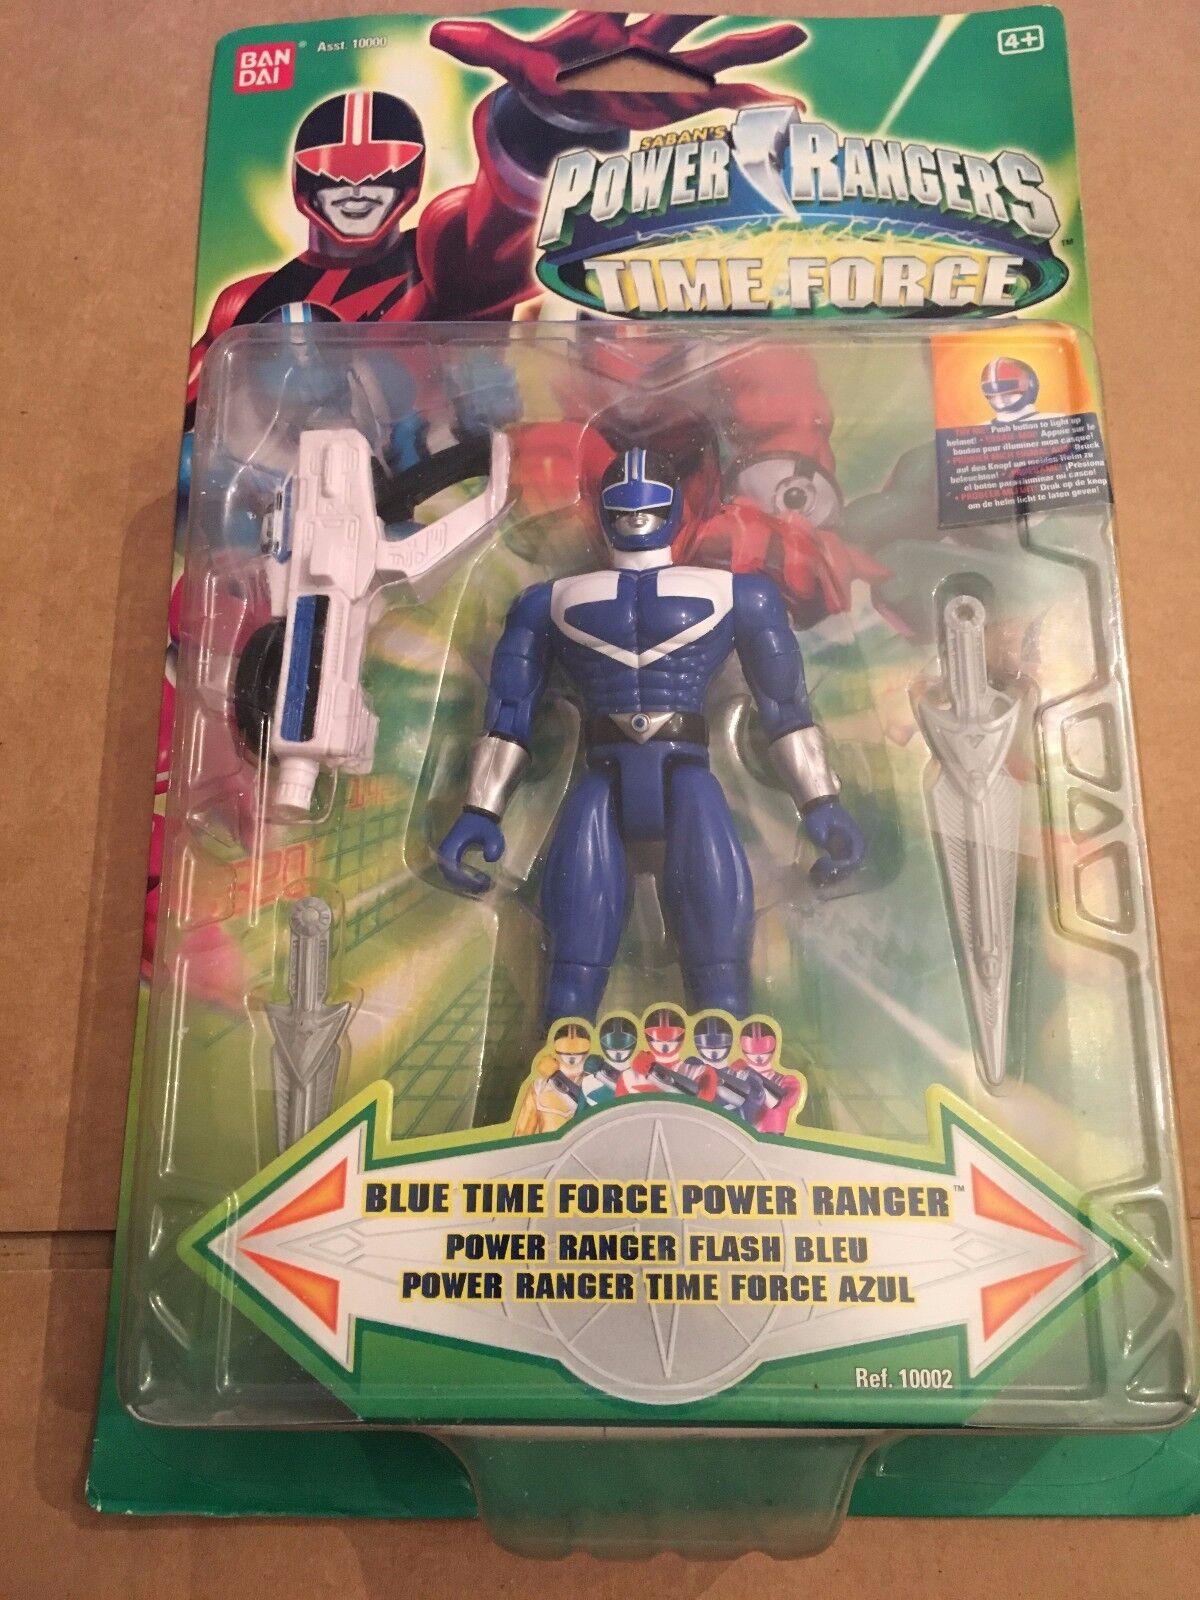 Power Rangers Blau time force power   new in blister pack    Mega rare toy